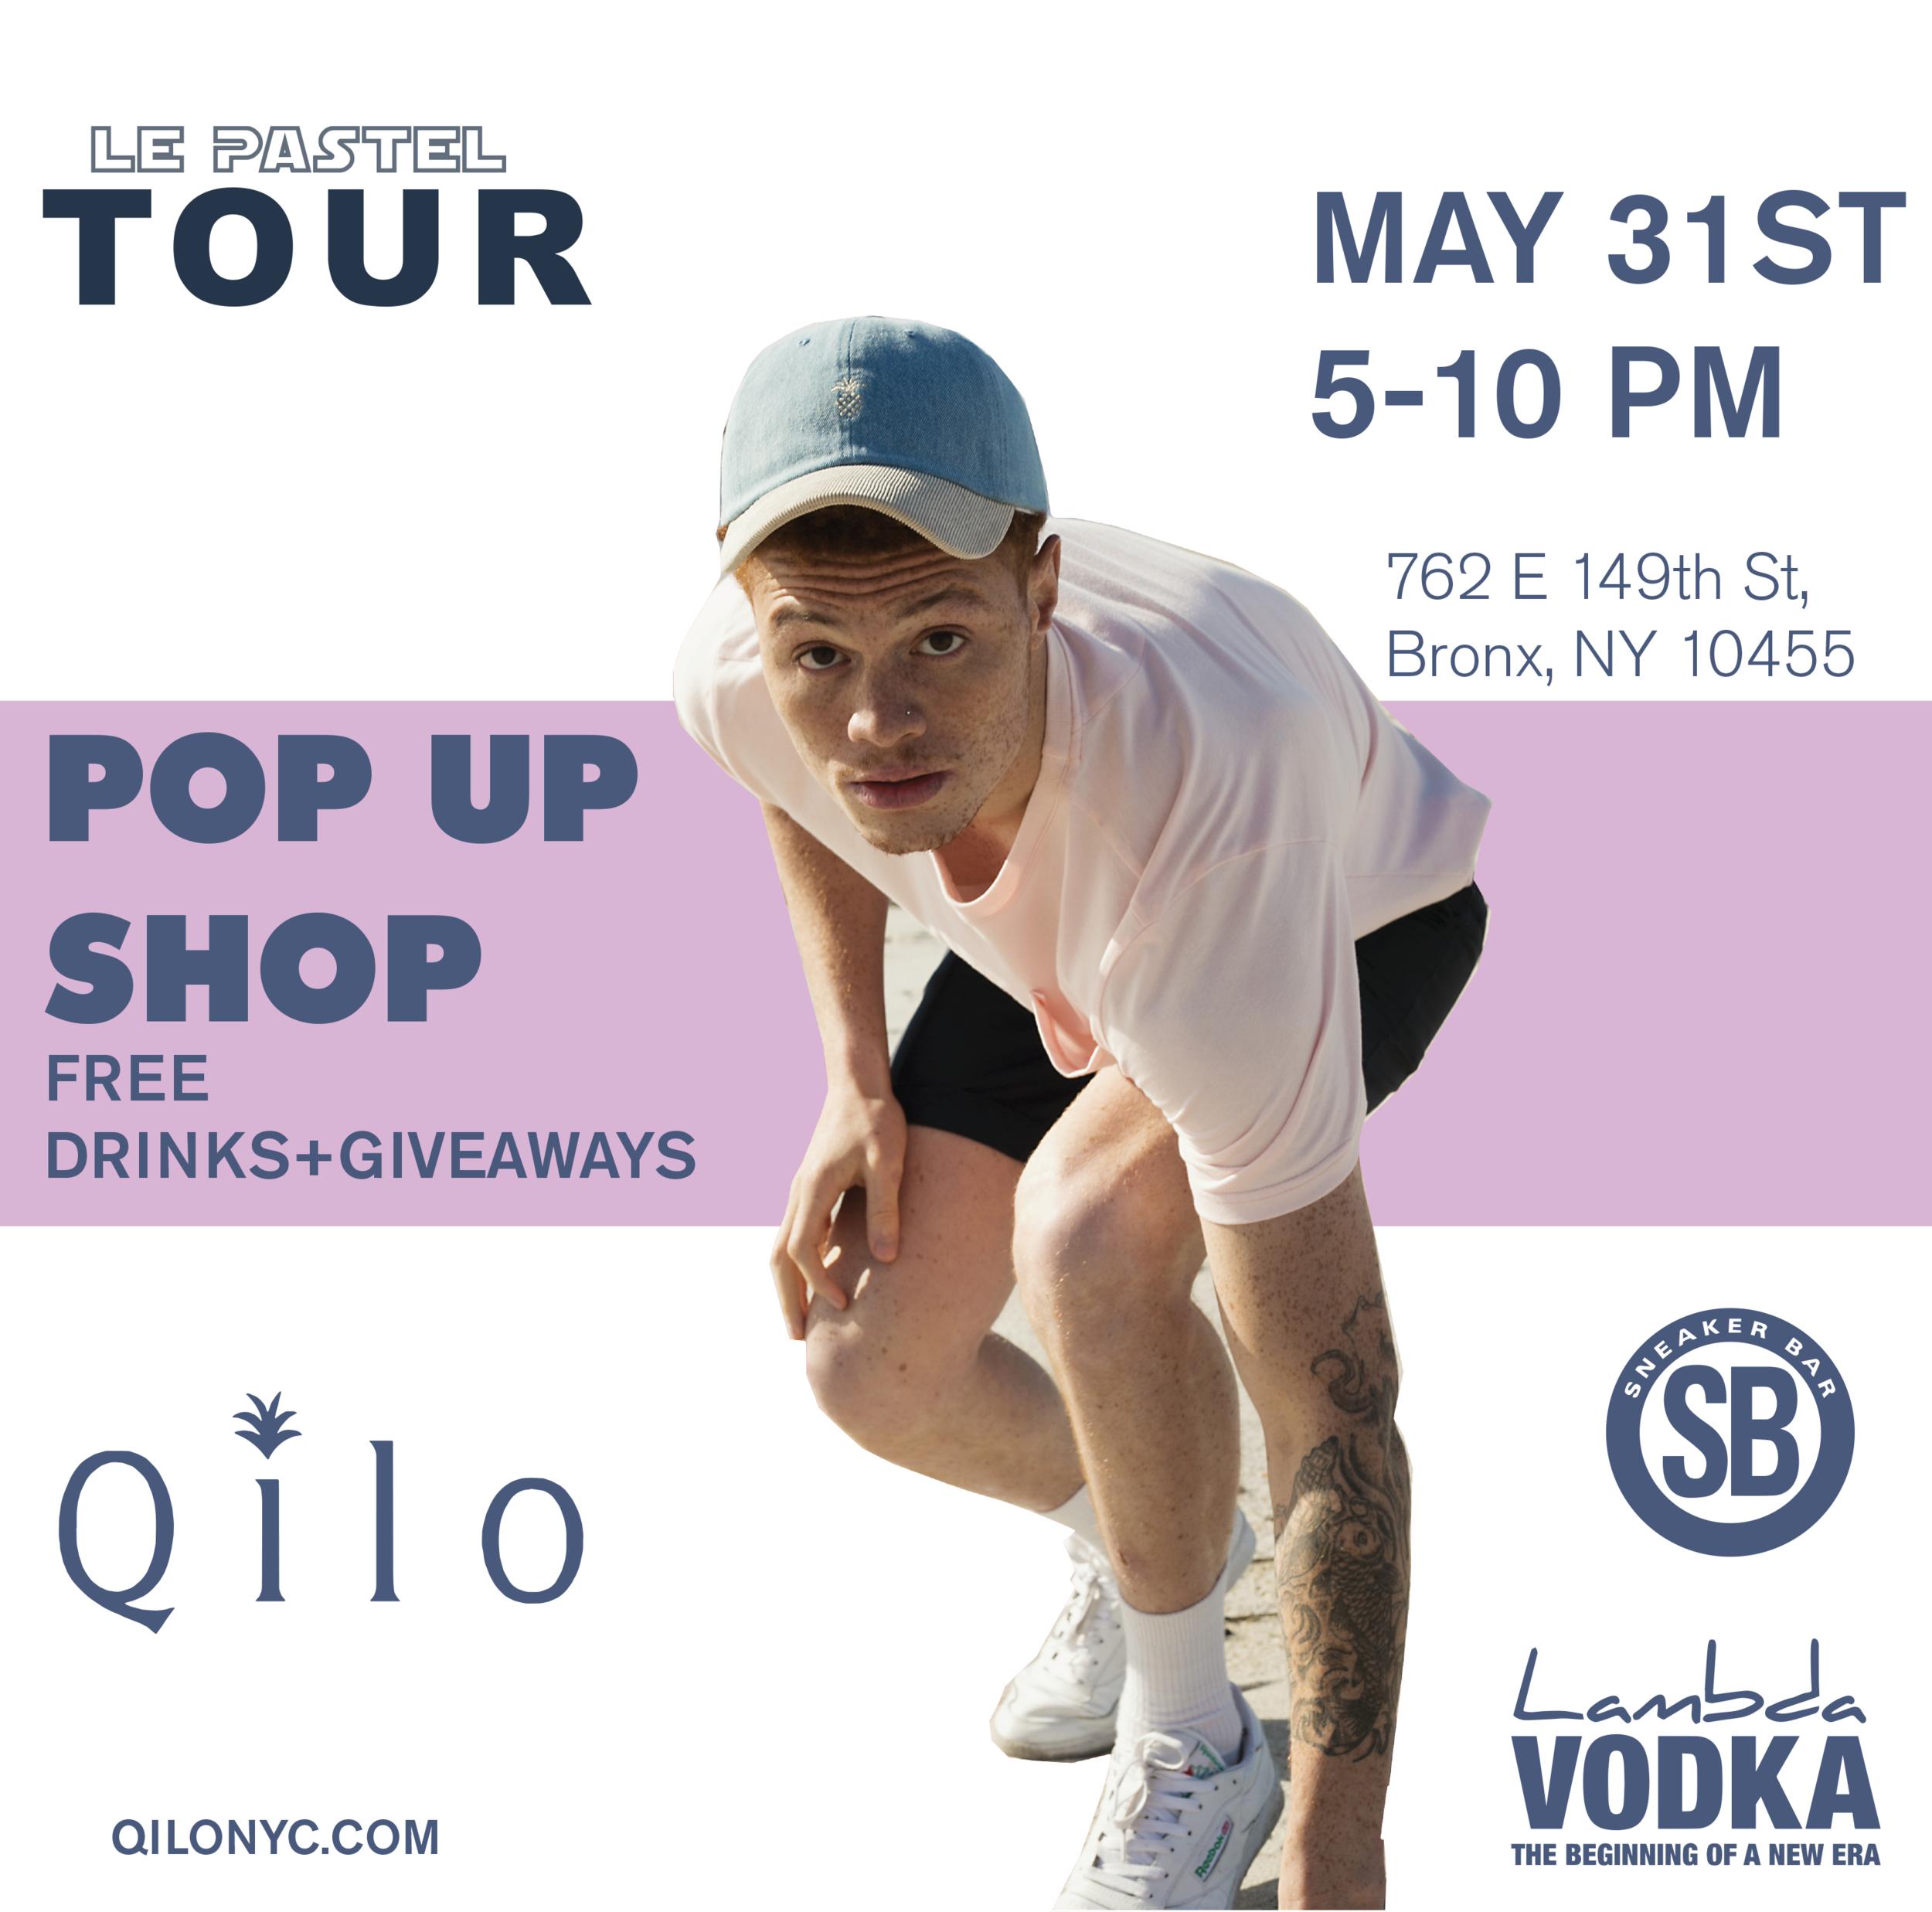 Qilo clothing brand - Pop-up shop